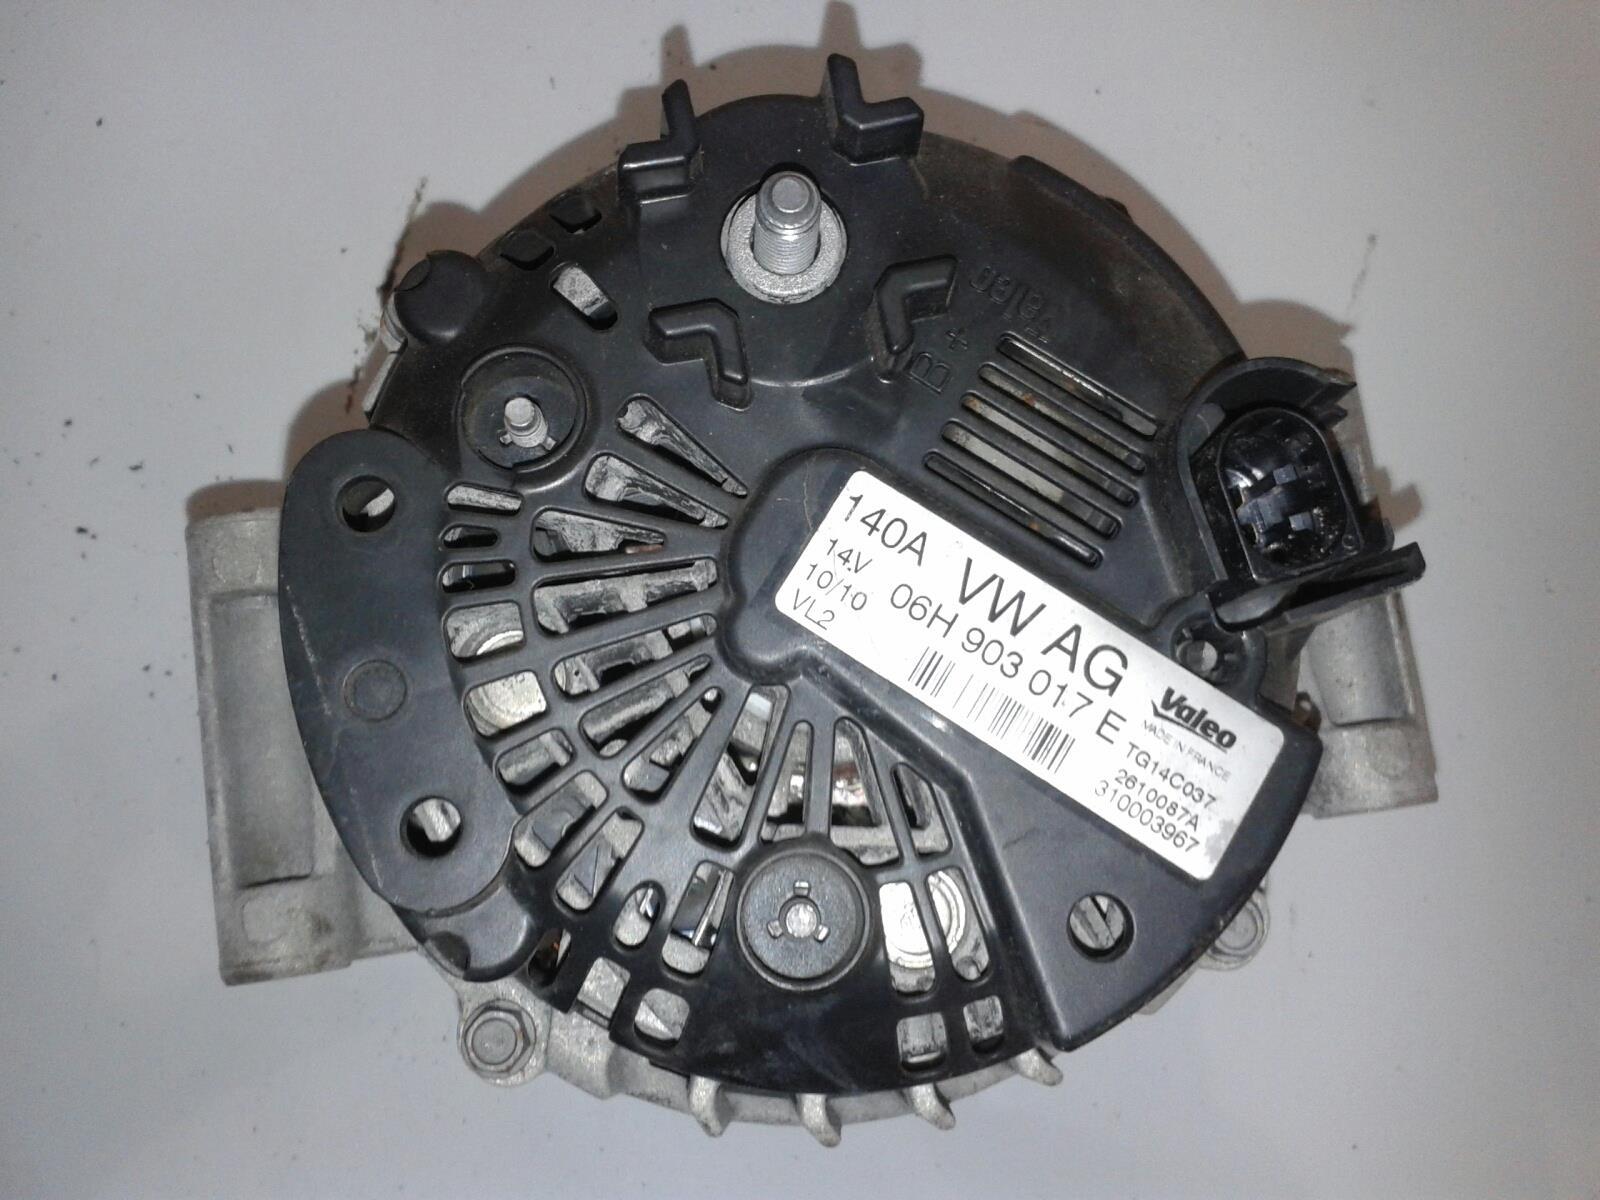 audi a3 2008 to 2013 alternator petrol manual for sale from rh motorhog co uk Audi A3 V6 Audi A3 TDI